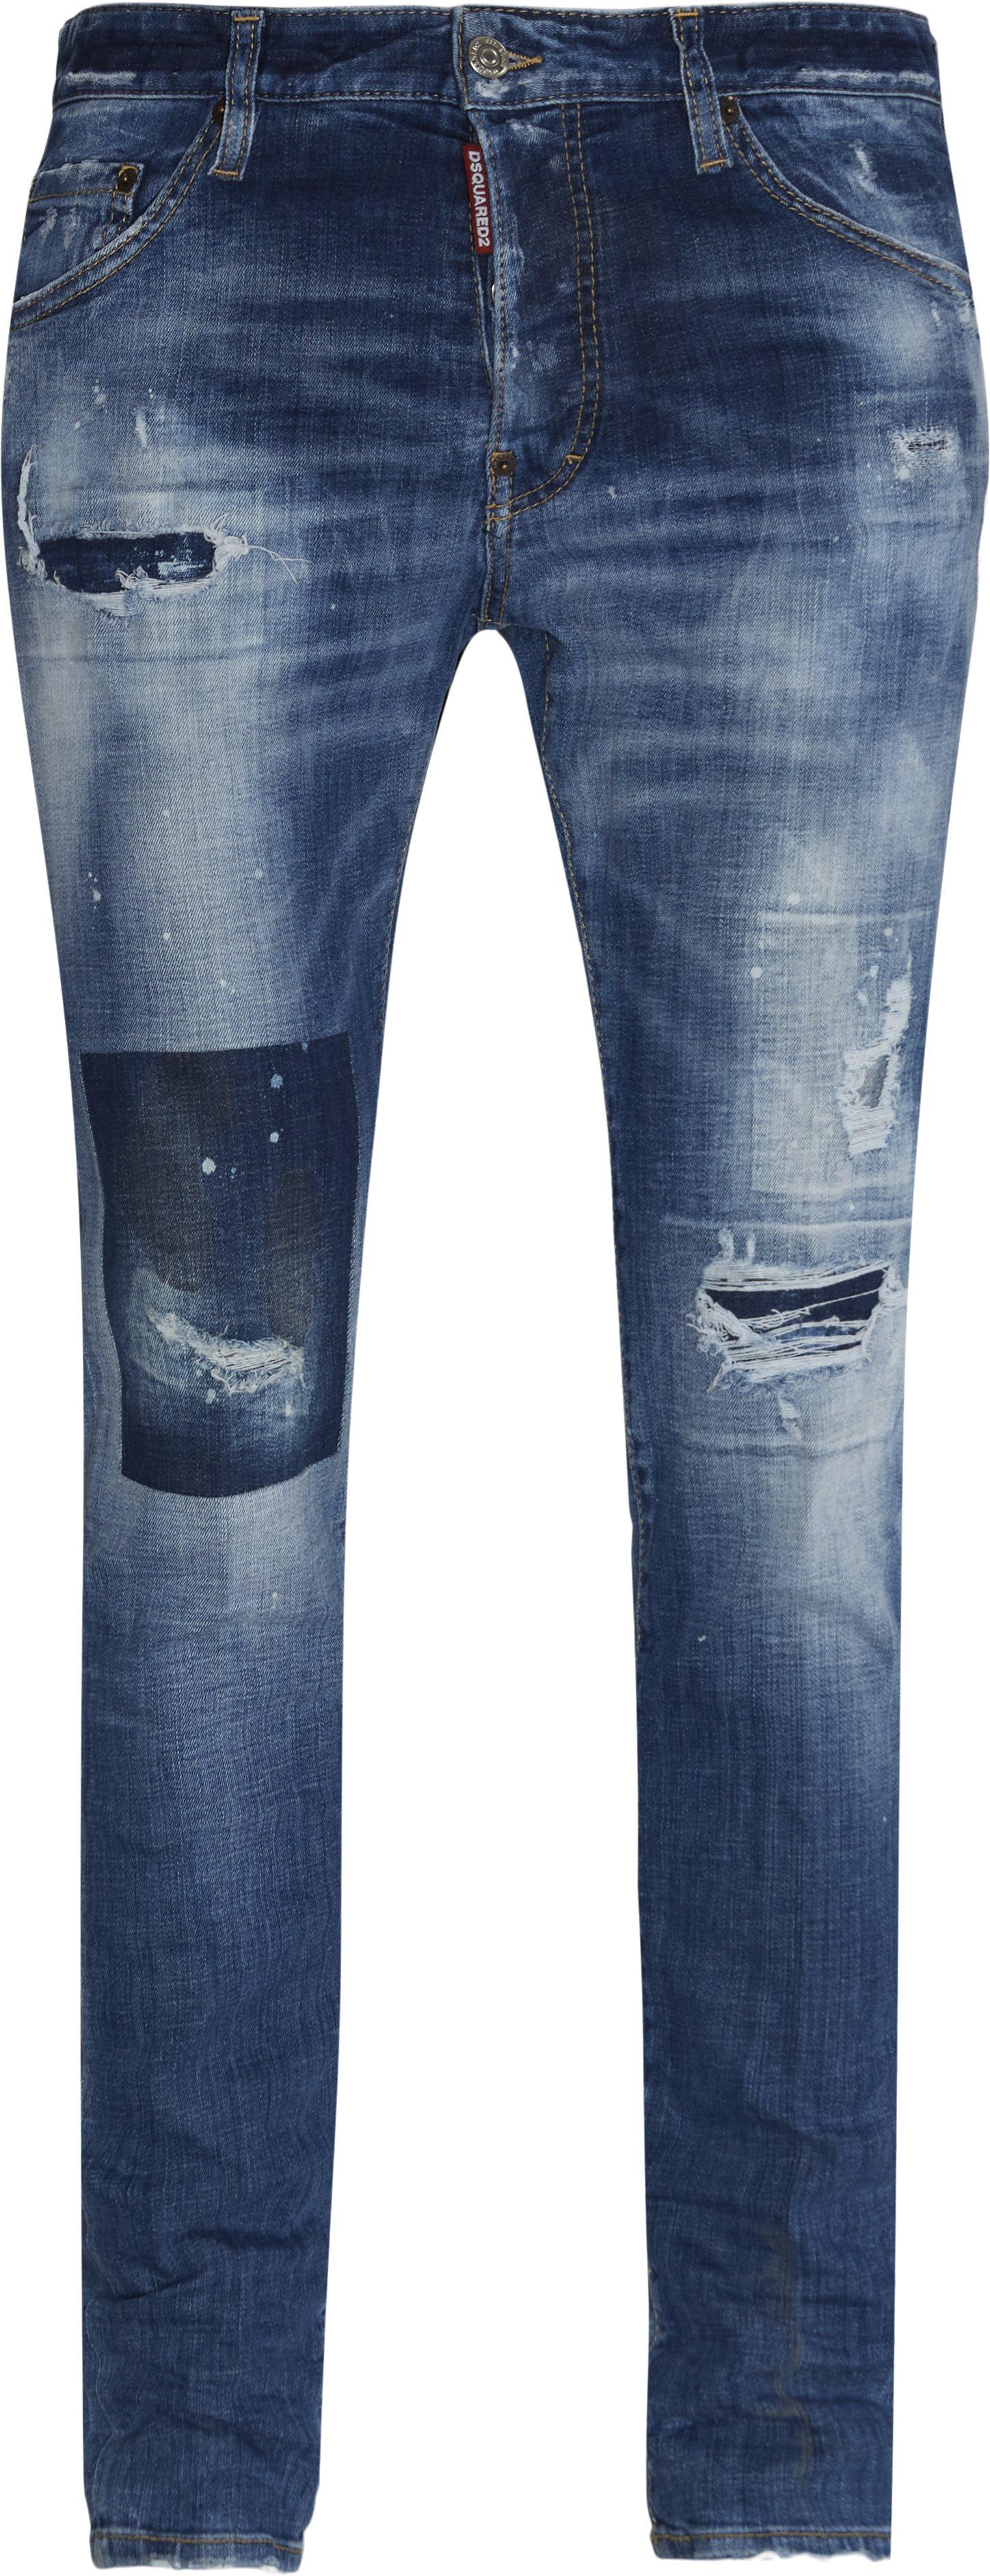 Cool Guy Jeans - Jeans - Denim